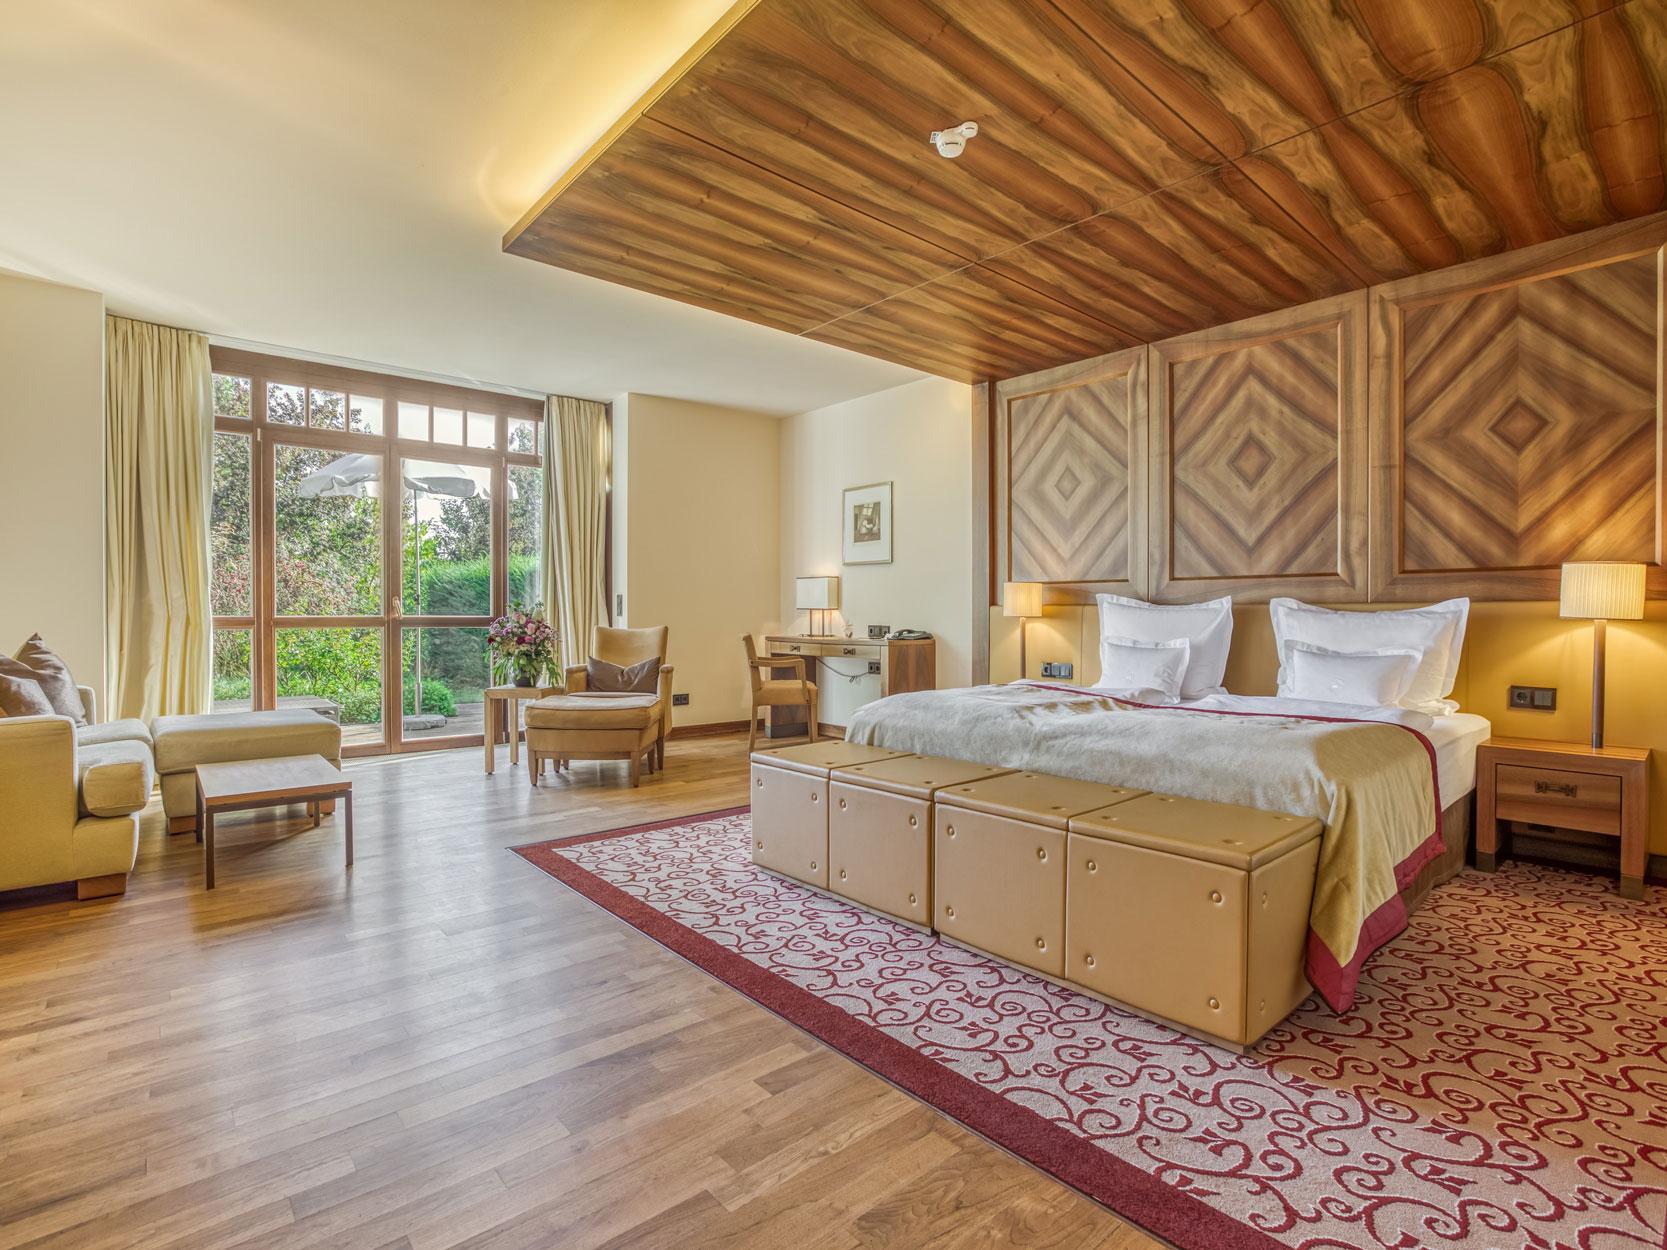 Doppelzimmer mit Holzelementen Hotel Friedrichsruhe